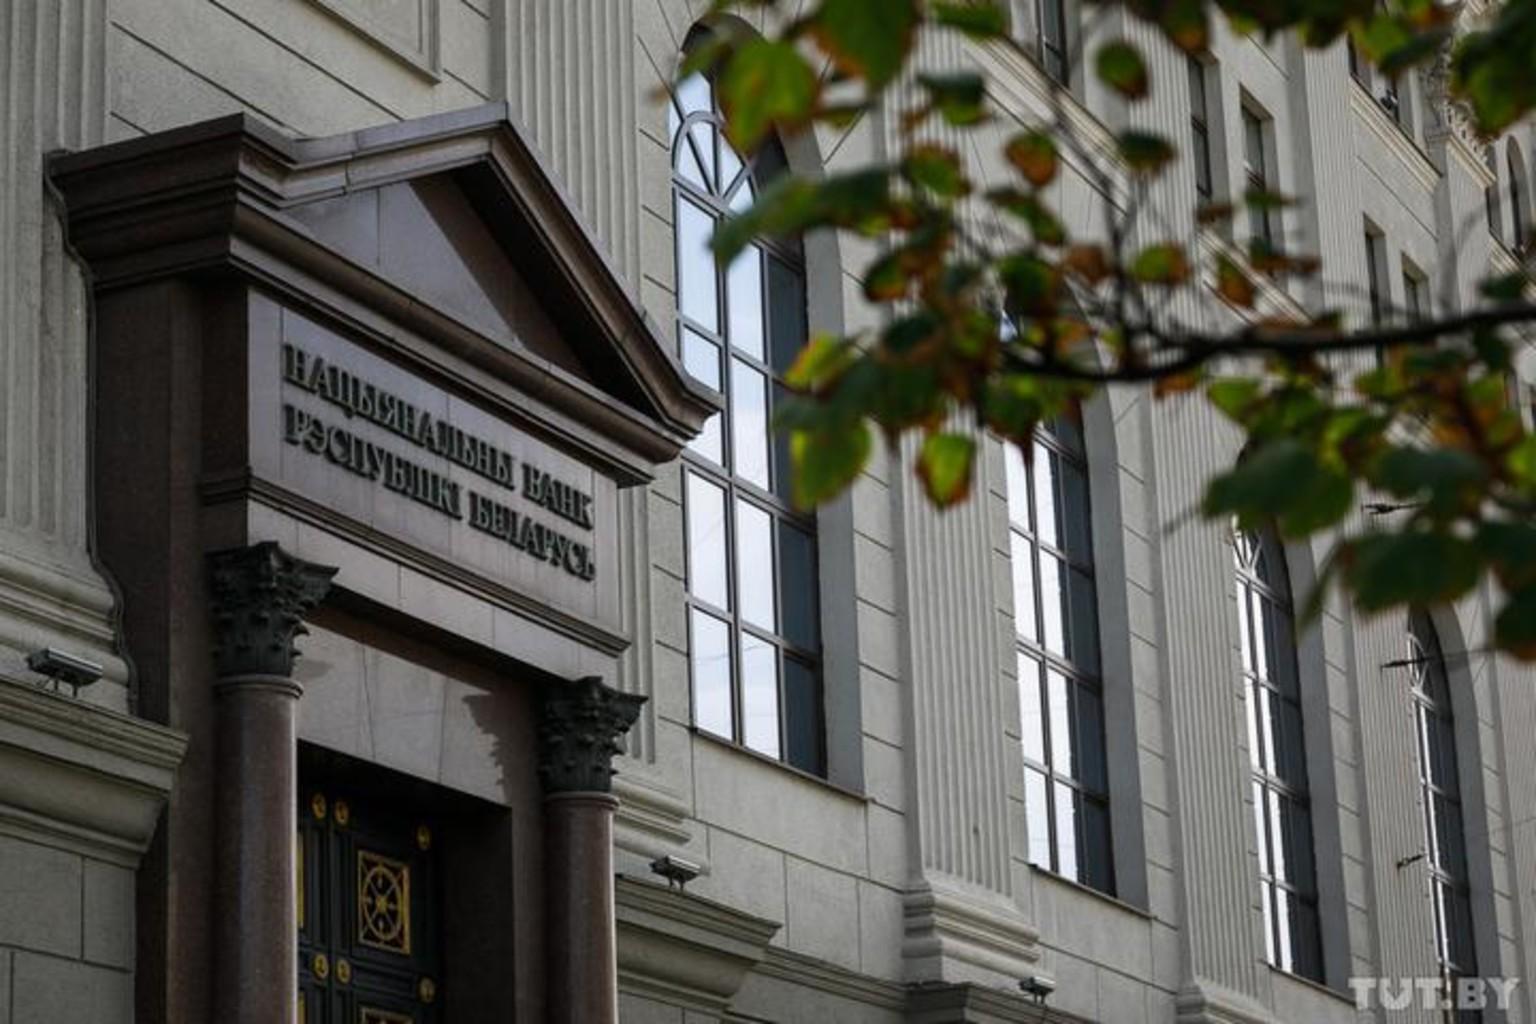 Nacionalnyi bank nacbank 20190730 shuk tutby phsl 1718